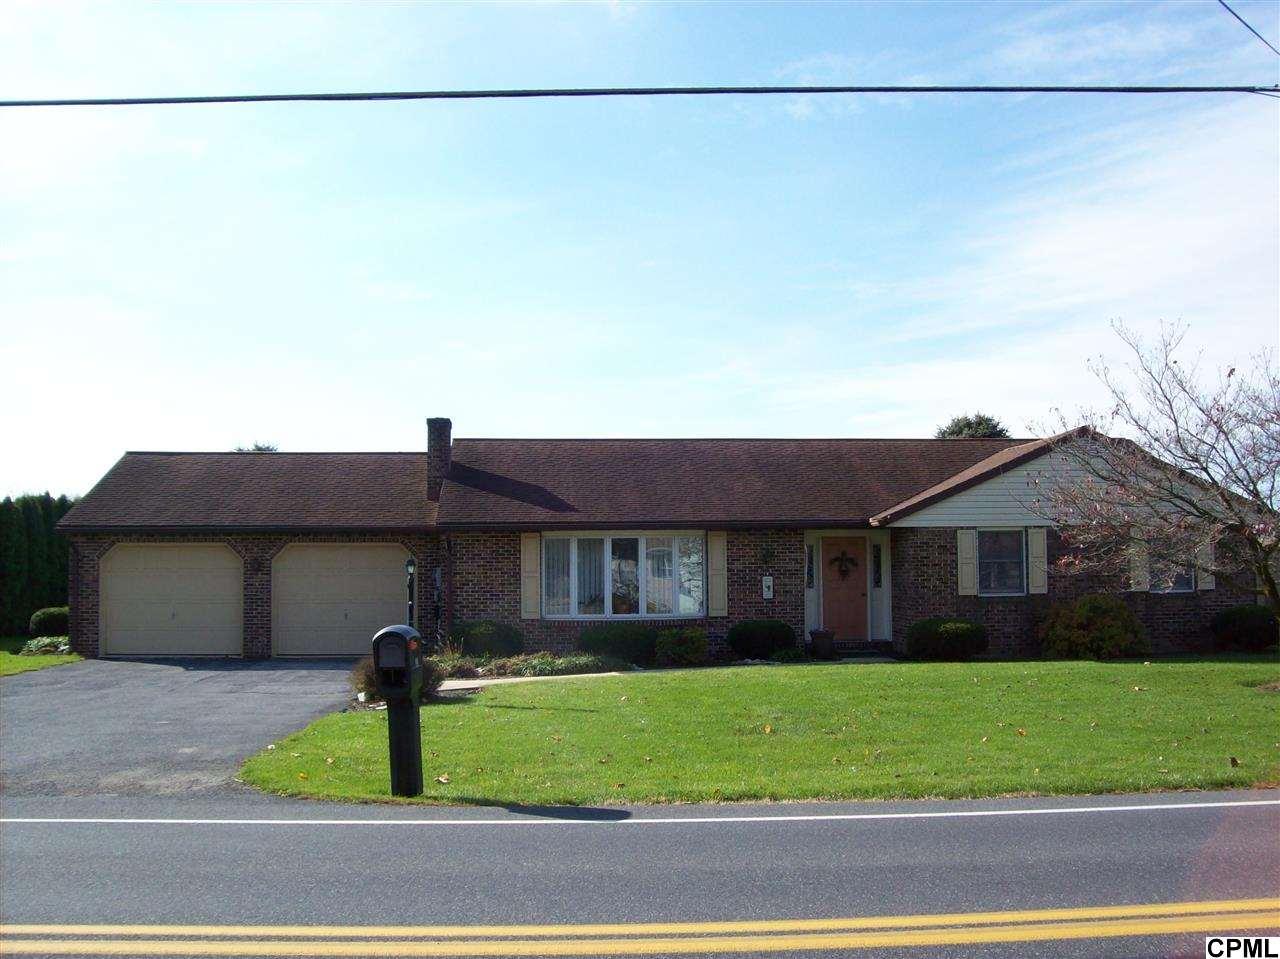 35 N Sheridan Rd, Newmanstown, PA 17073